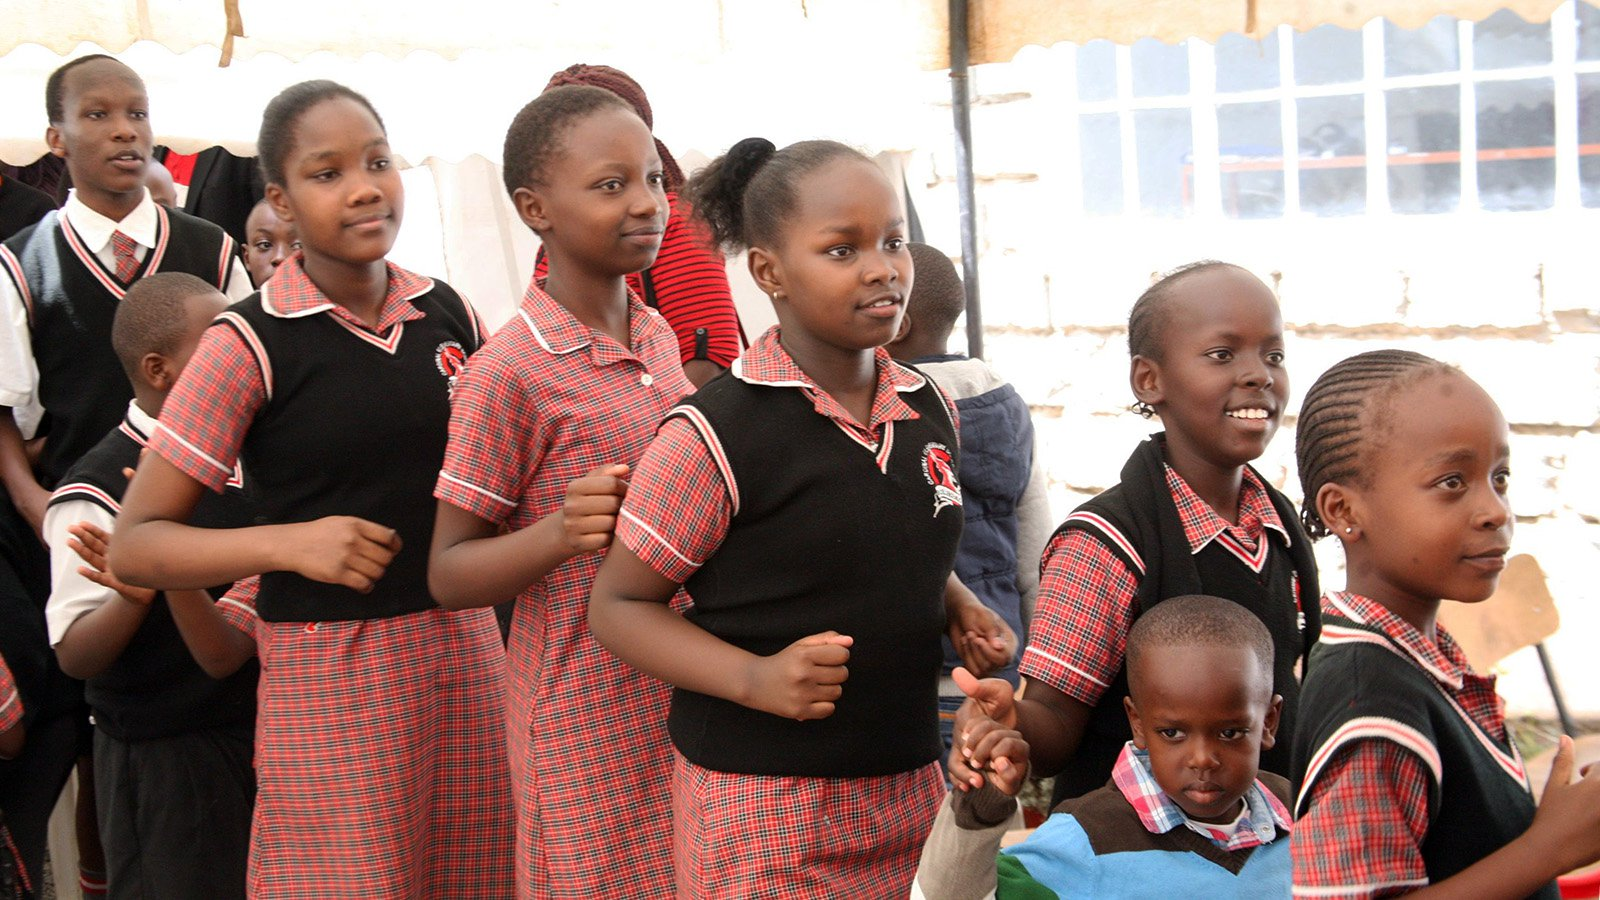 Kenya school students